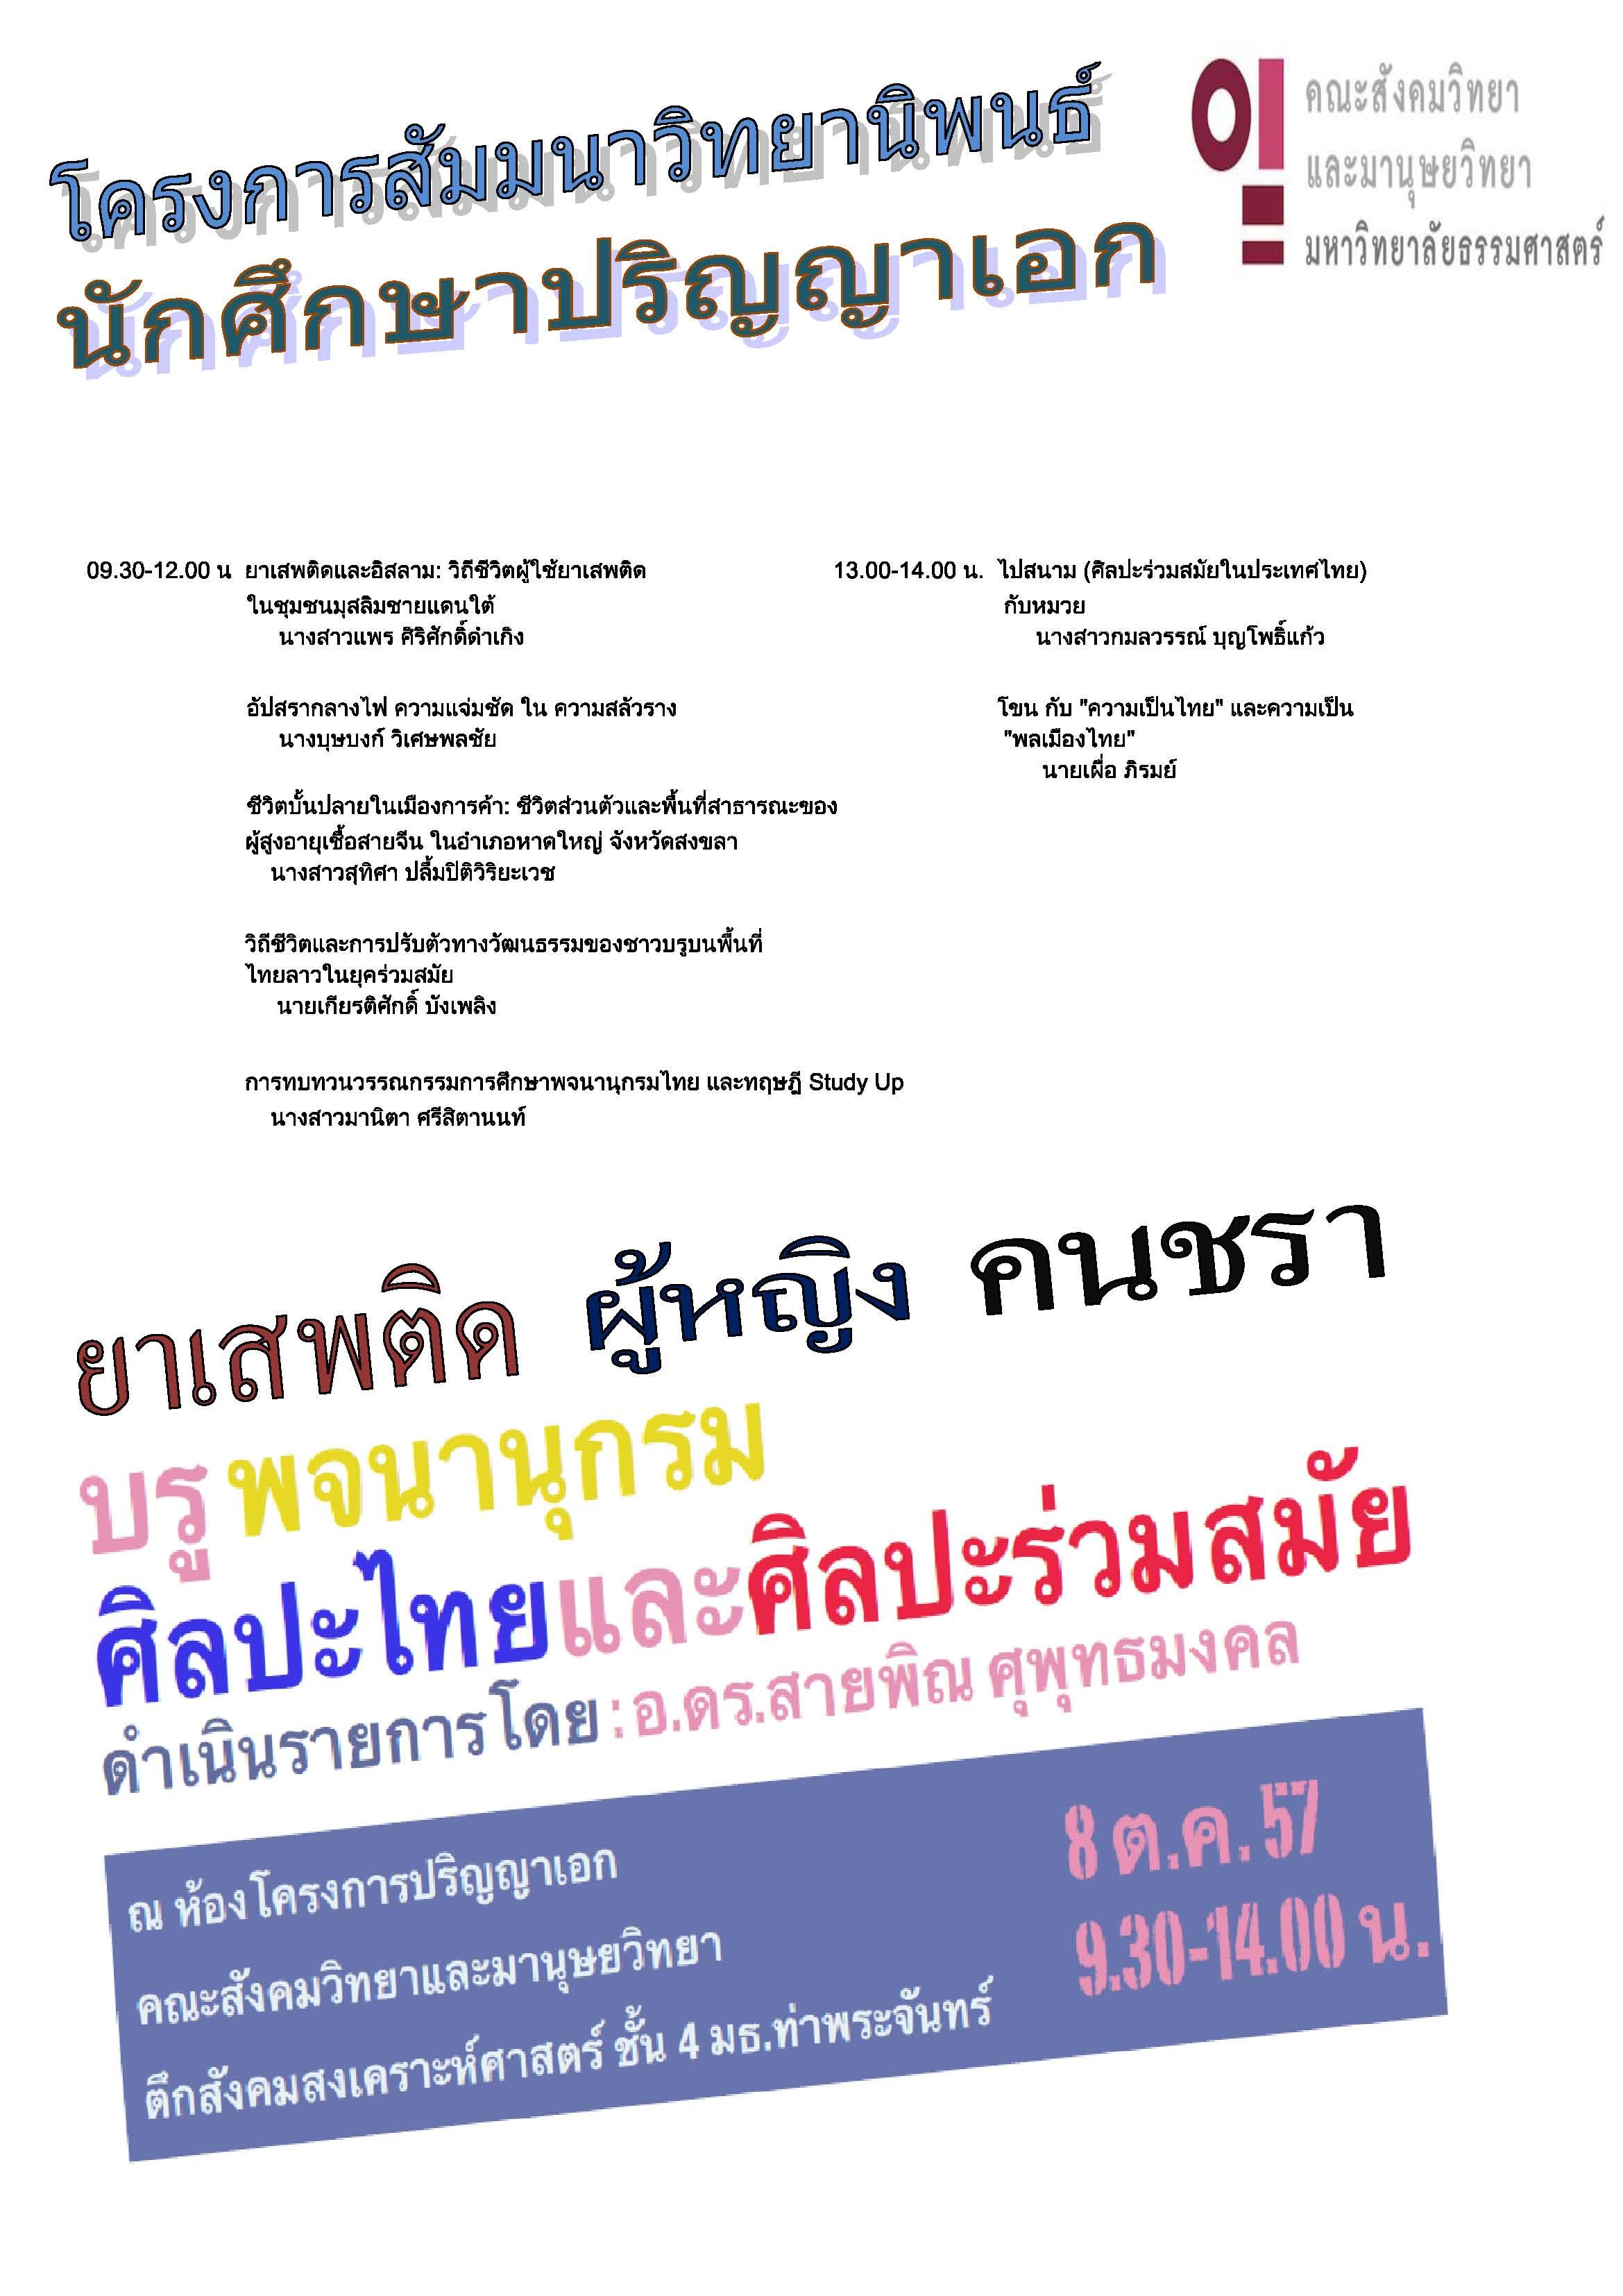 phd-seminar-2014